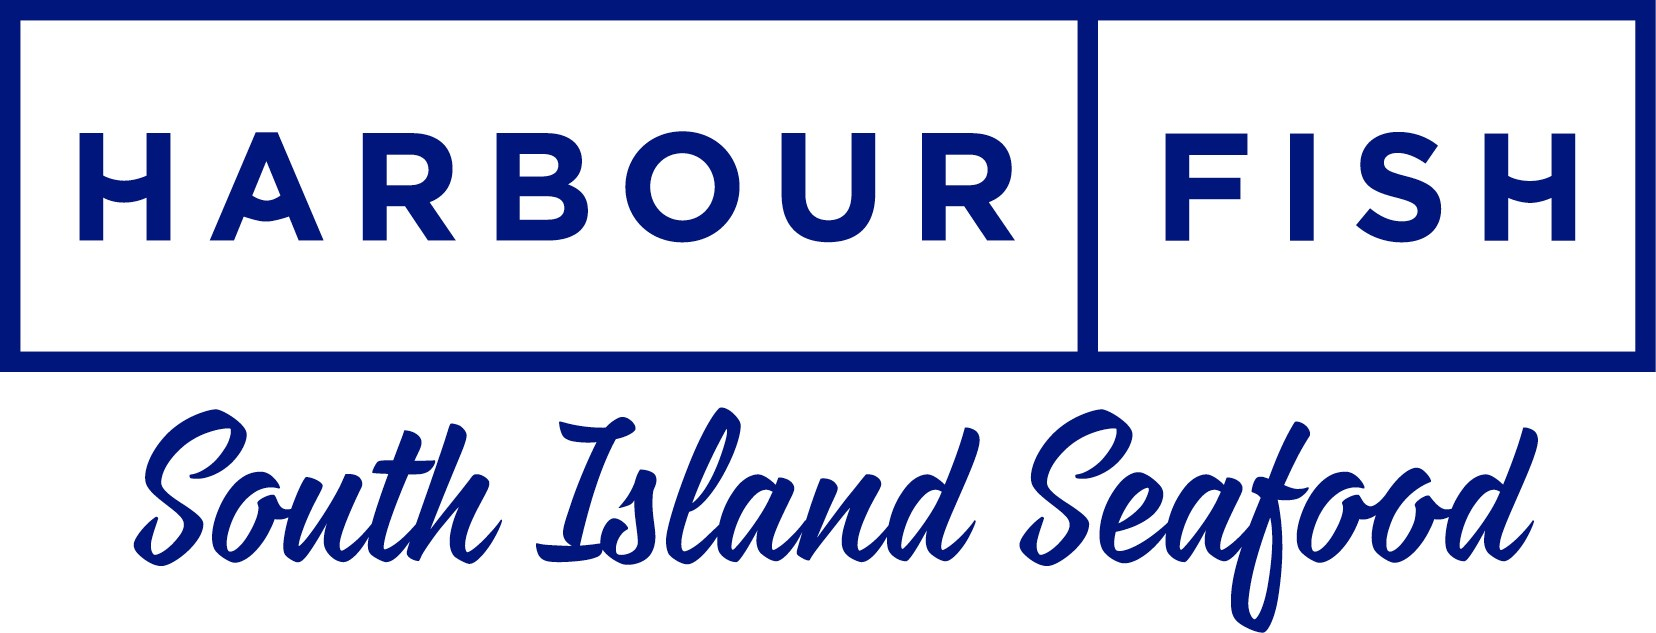 Harbour Fish - Logo.jpg